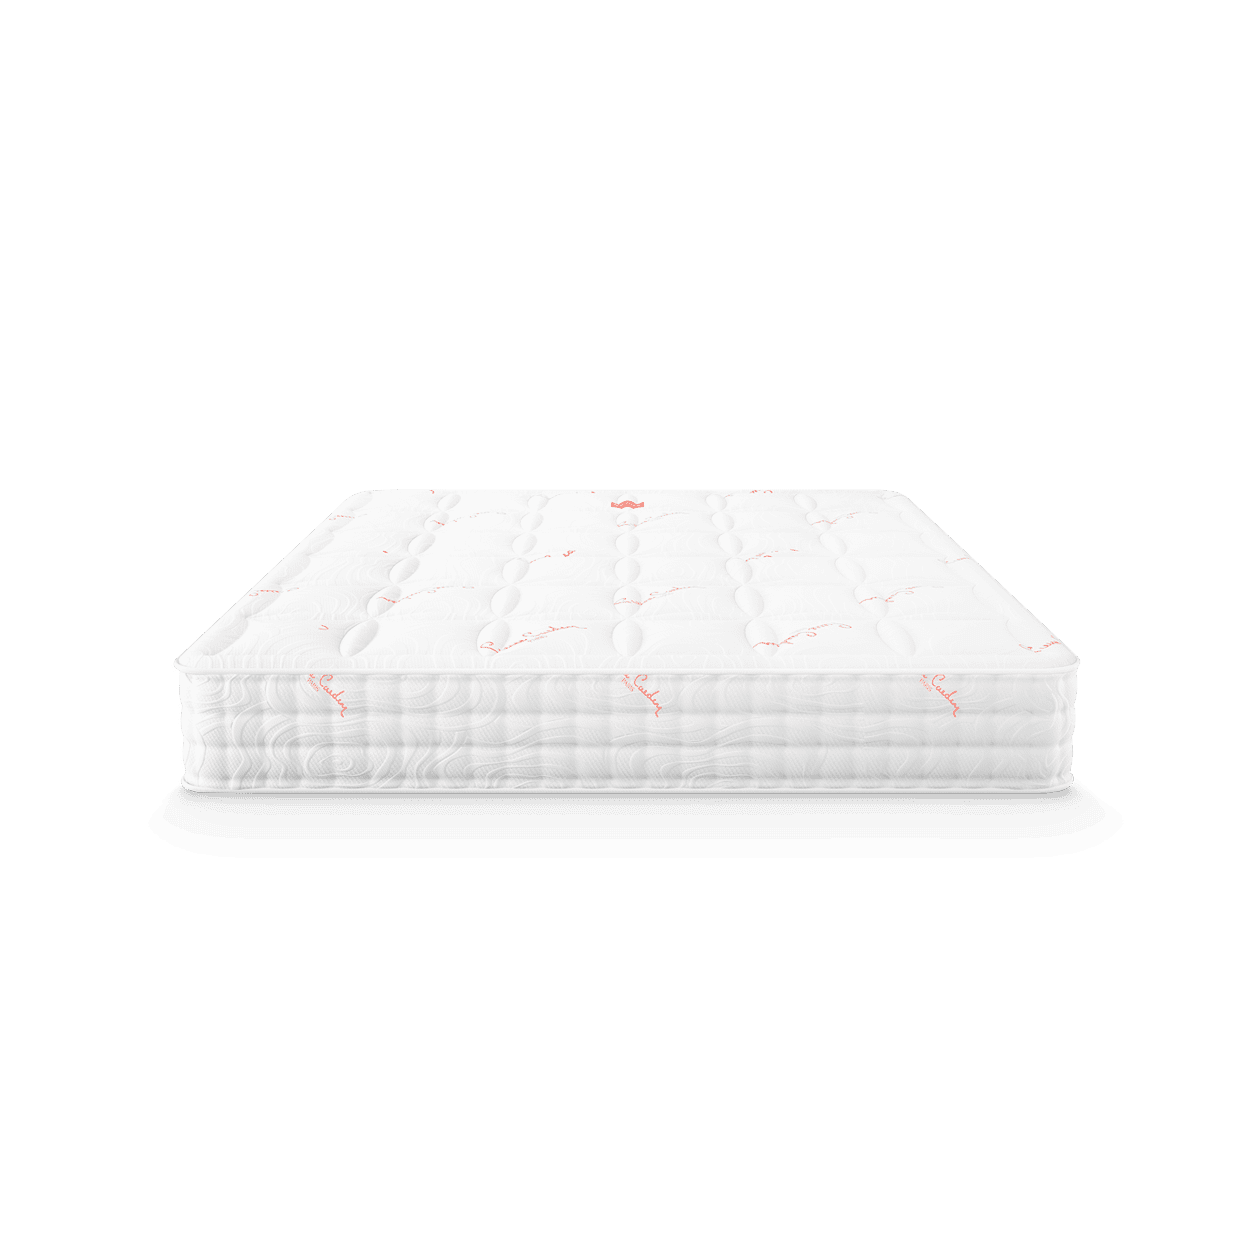 Mattresses Magniflex RIVIERA BY PIERRE CARDIN